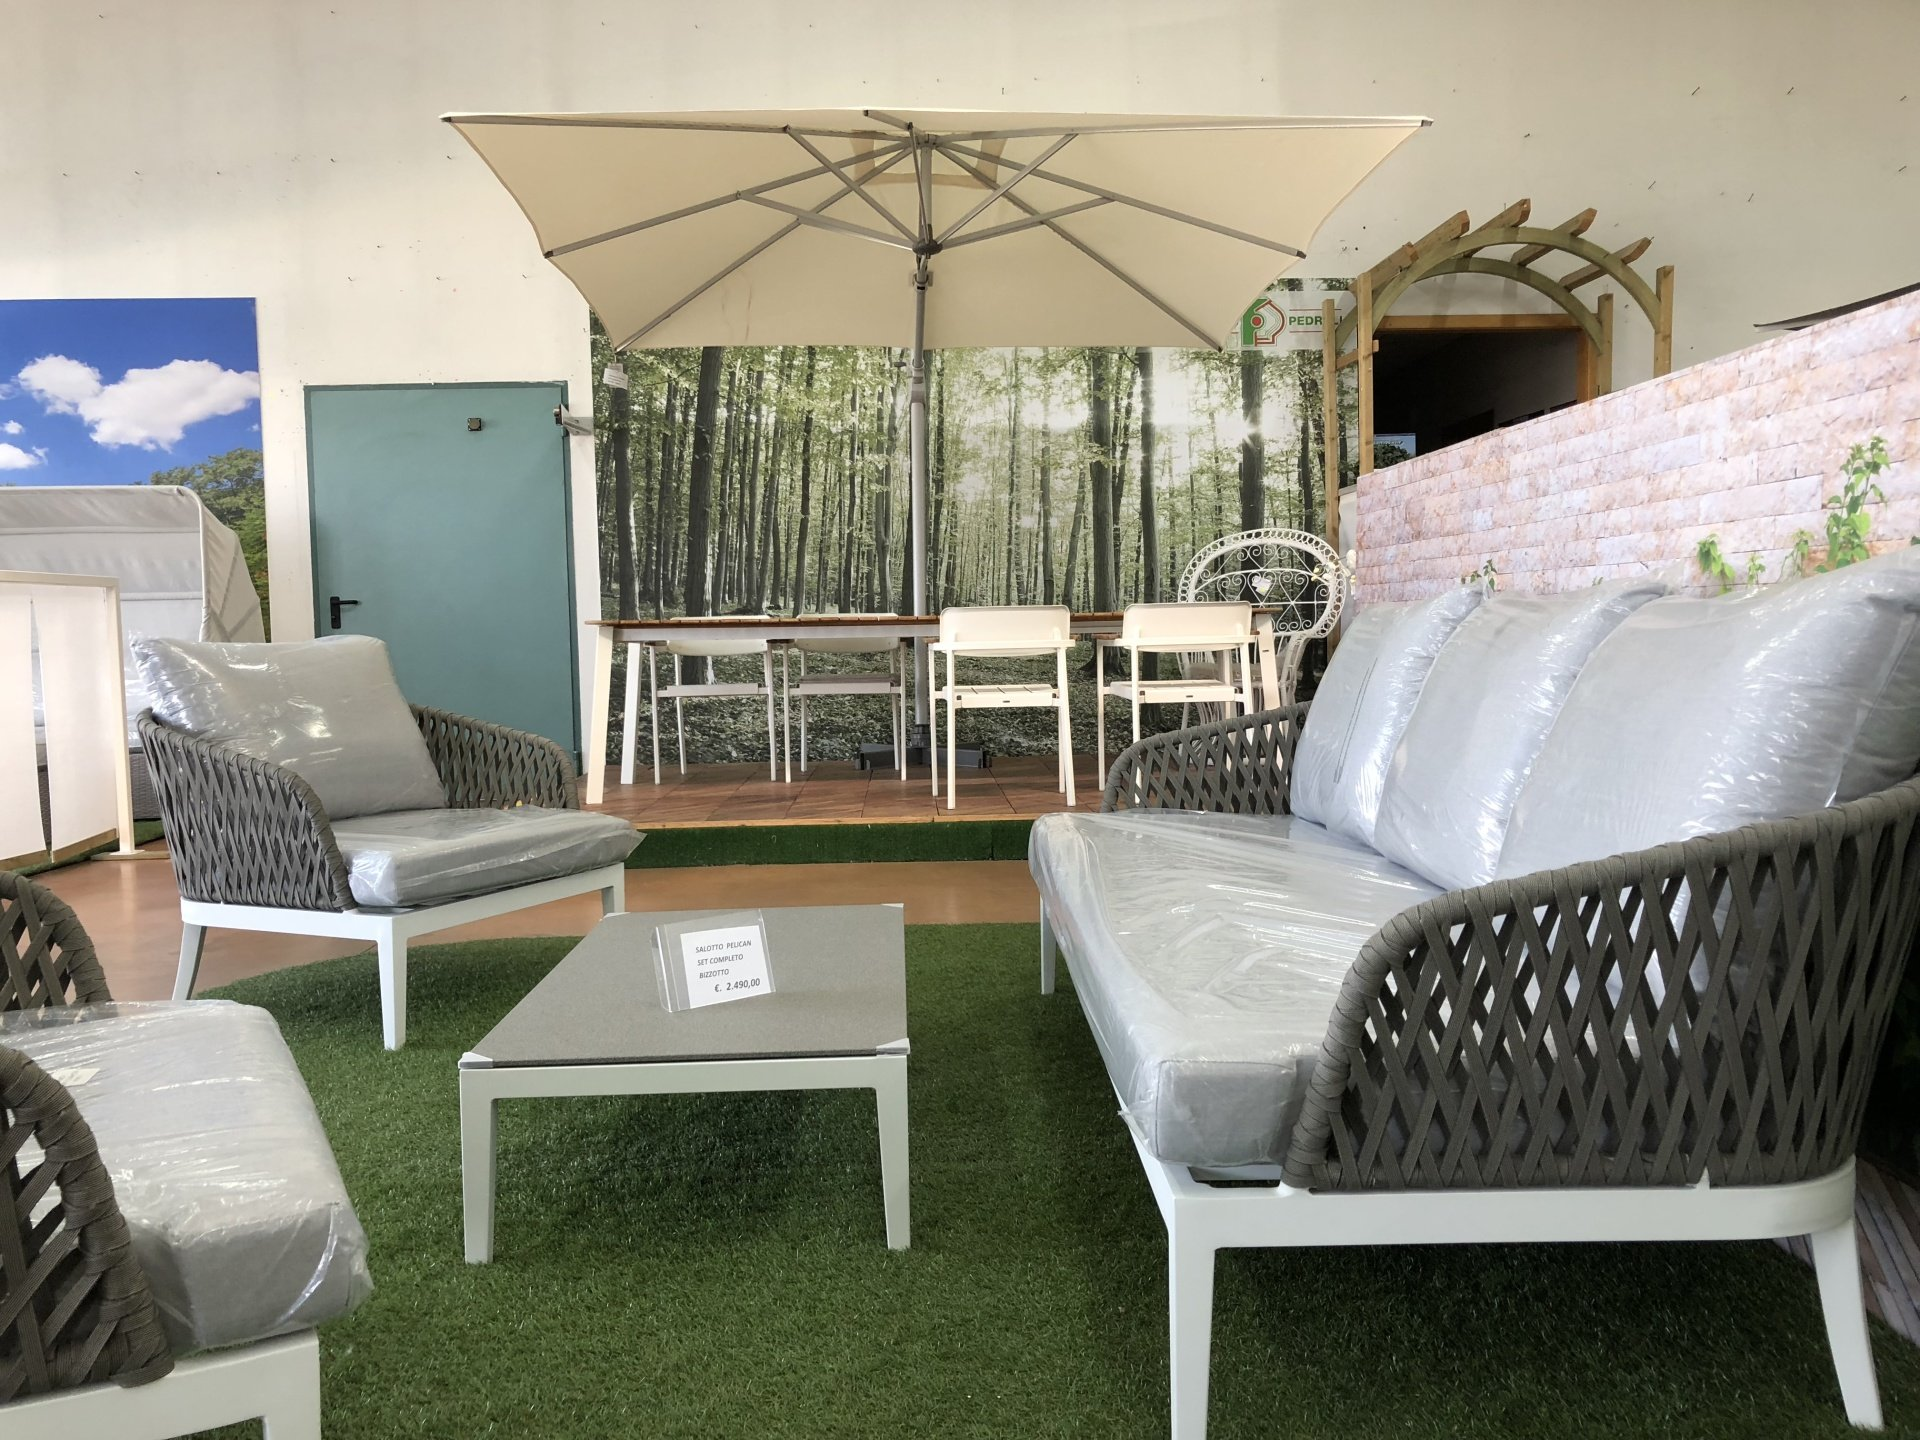 vendita mobili da esterno brescia bergamo emporio